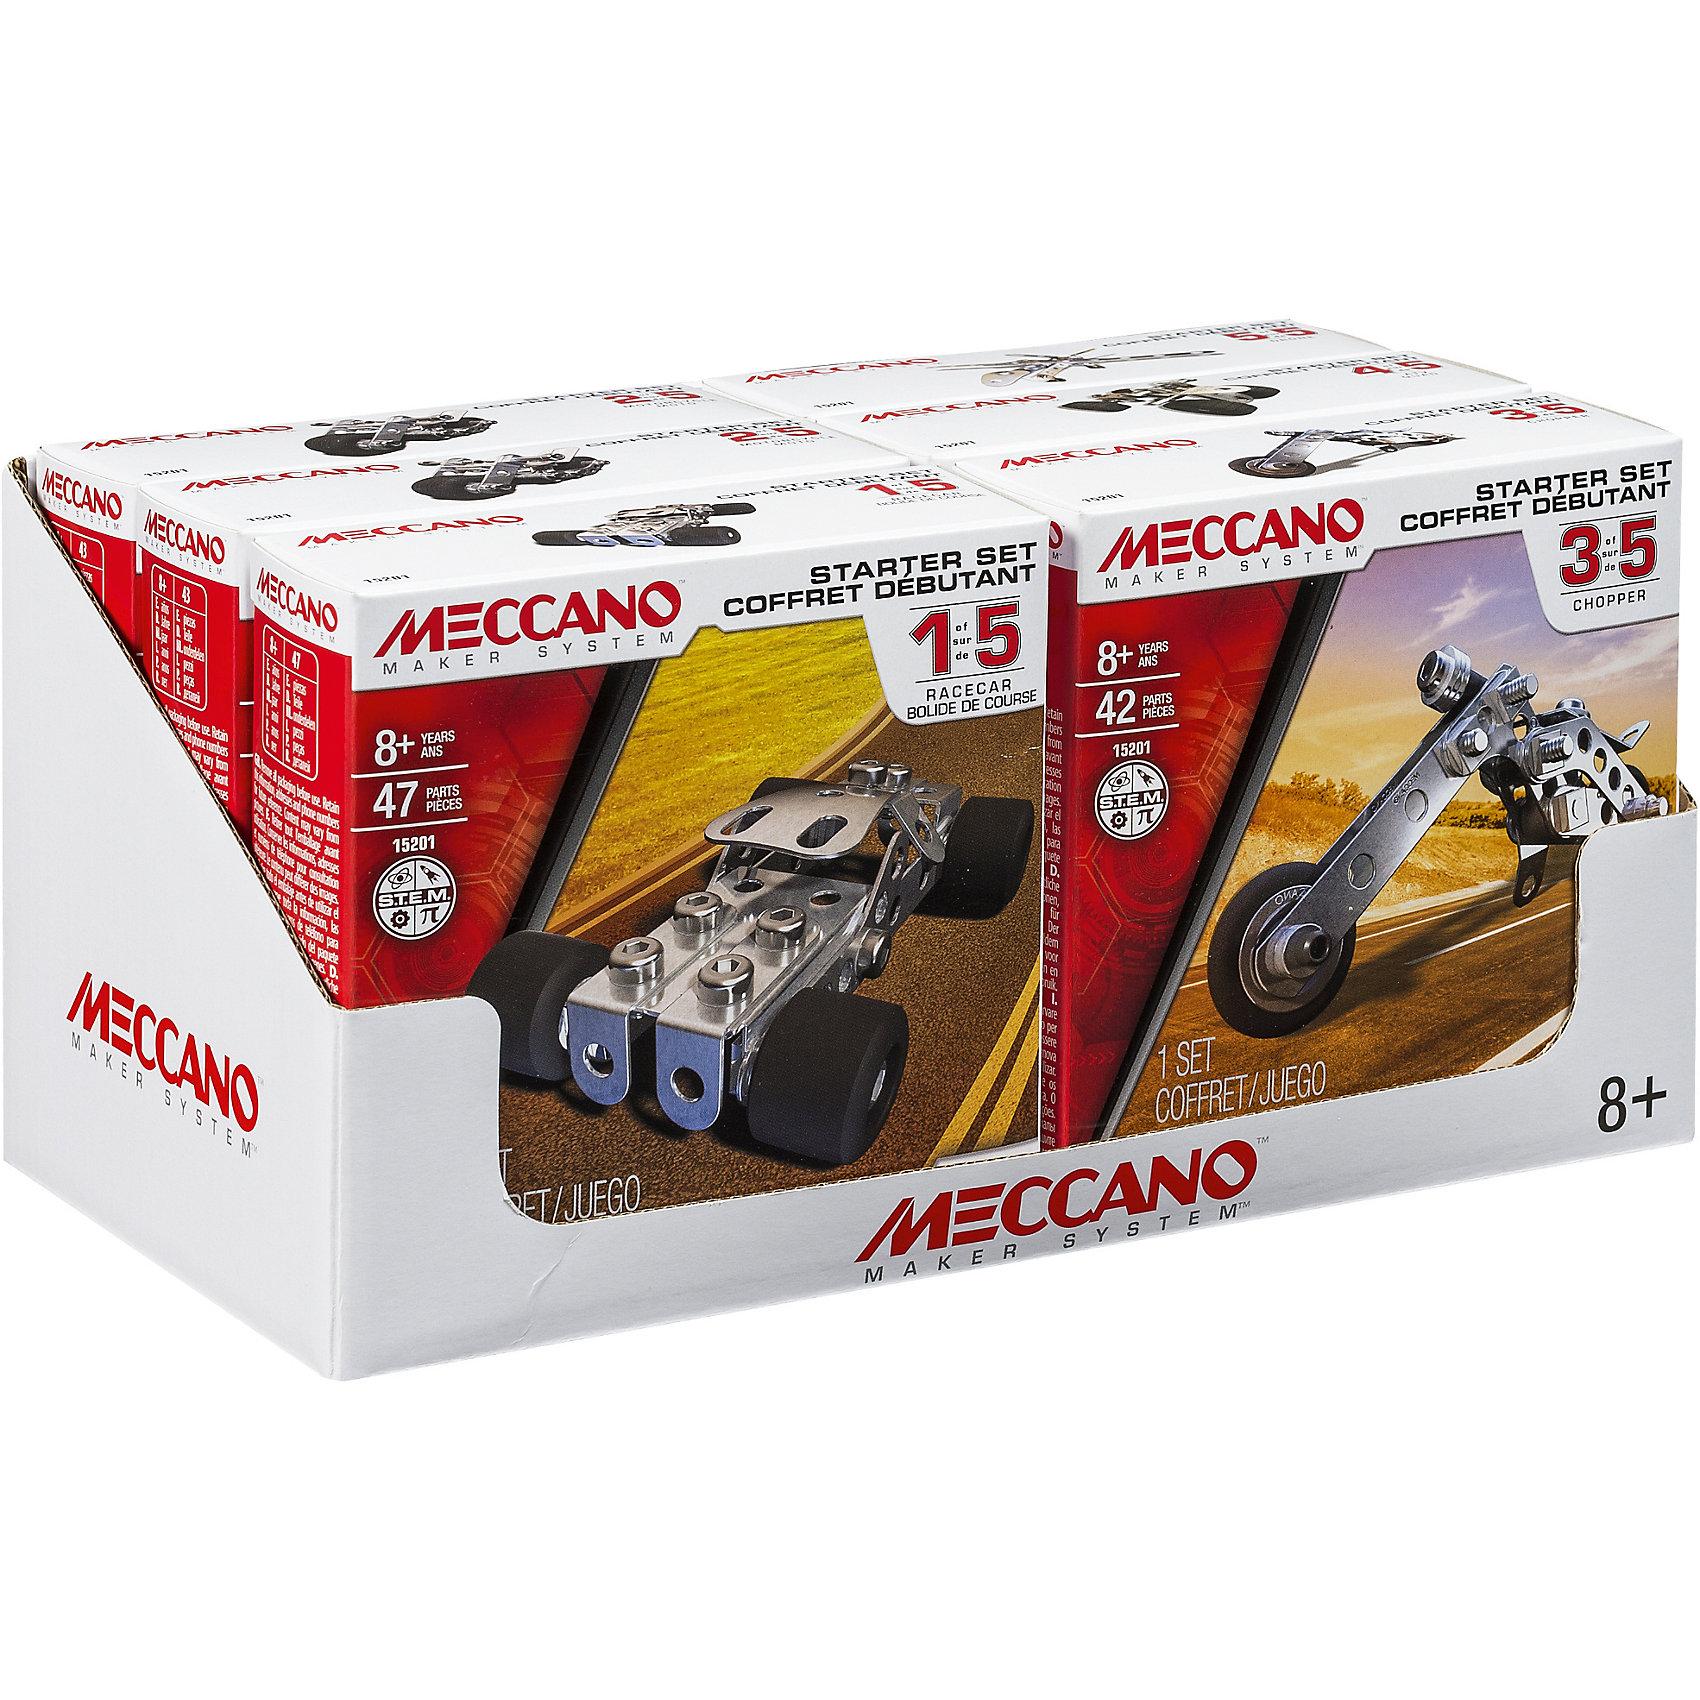 Meccano Базовая модель, Meccano, в ассортименте meccano